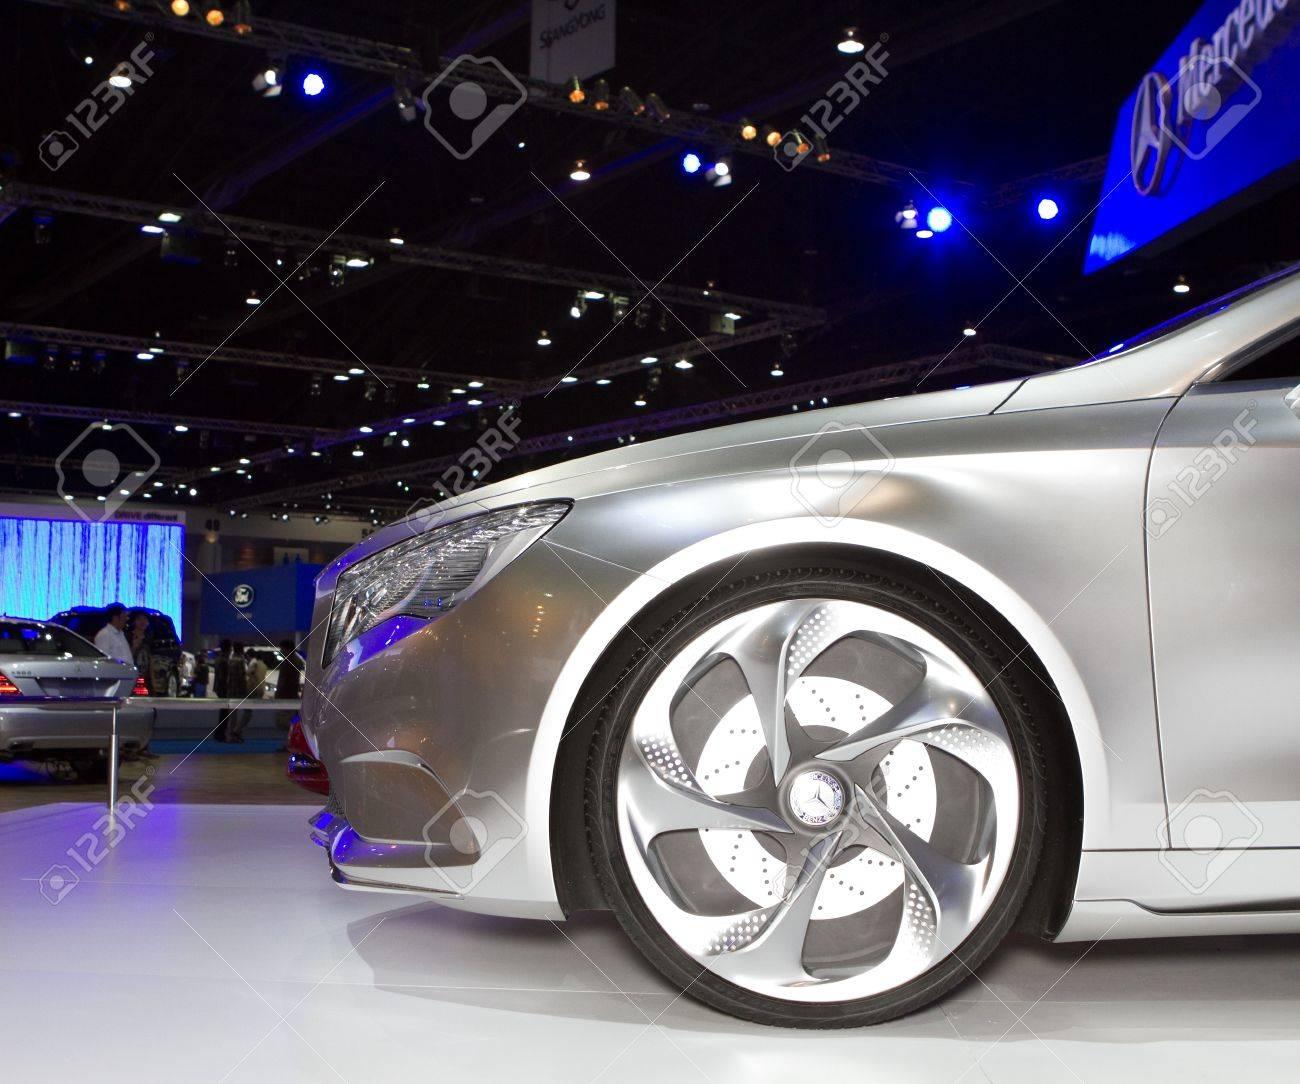 BANGKOK - APRIL 2: Mercedes Benz class A concept car wheel on display at the 33rd Bangkok International Motor Show on April 2, 2012 in Bangkok, Thailand. Stock Photo - 13244853